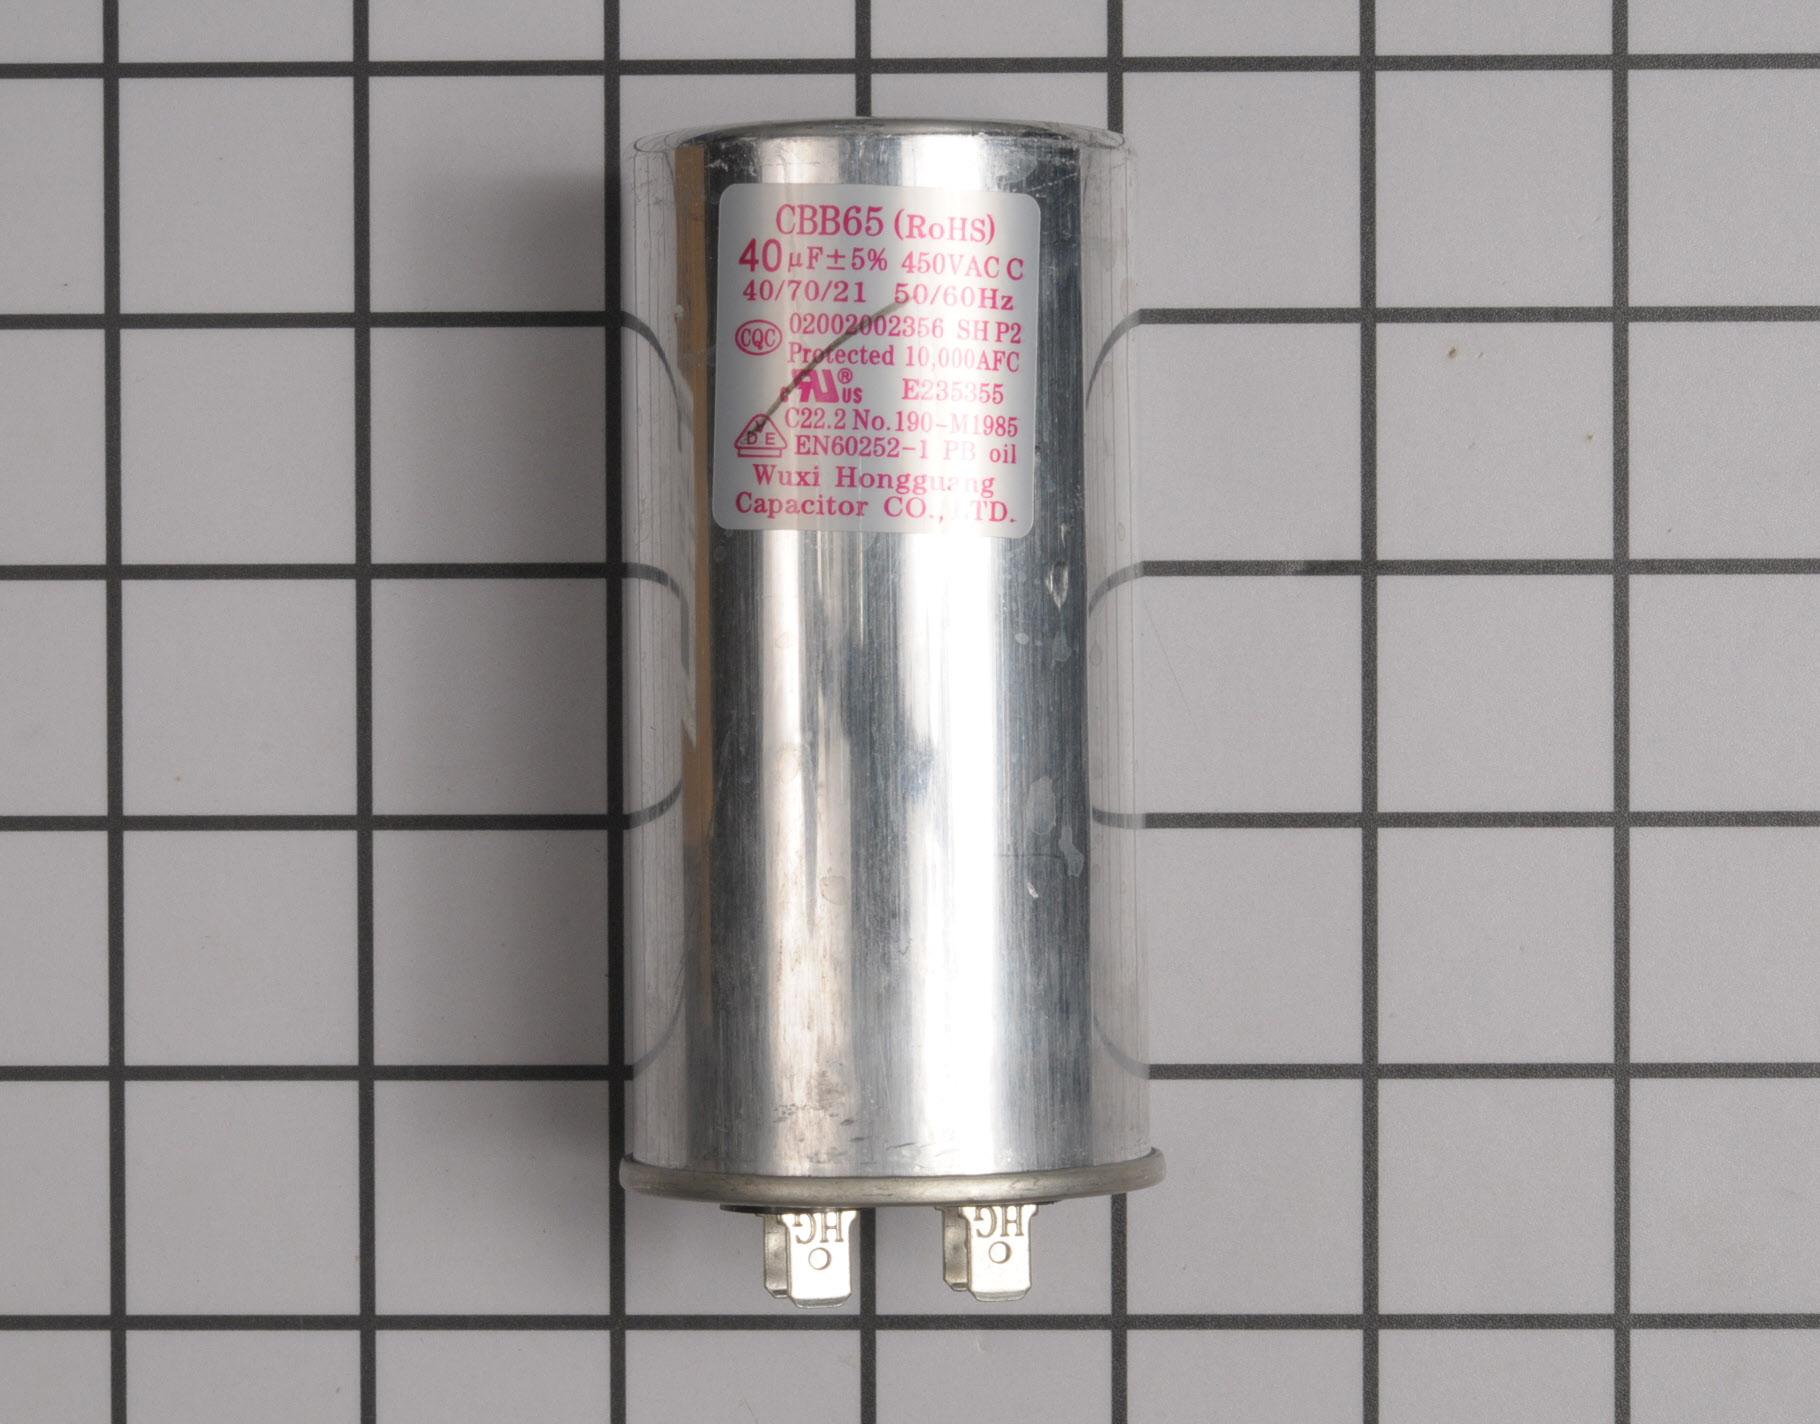 Kenmore Air Conditioner Part # 5304475736 - Capacitor